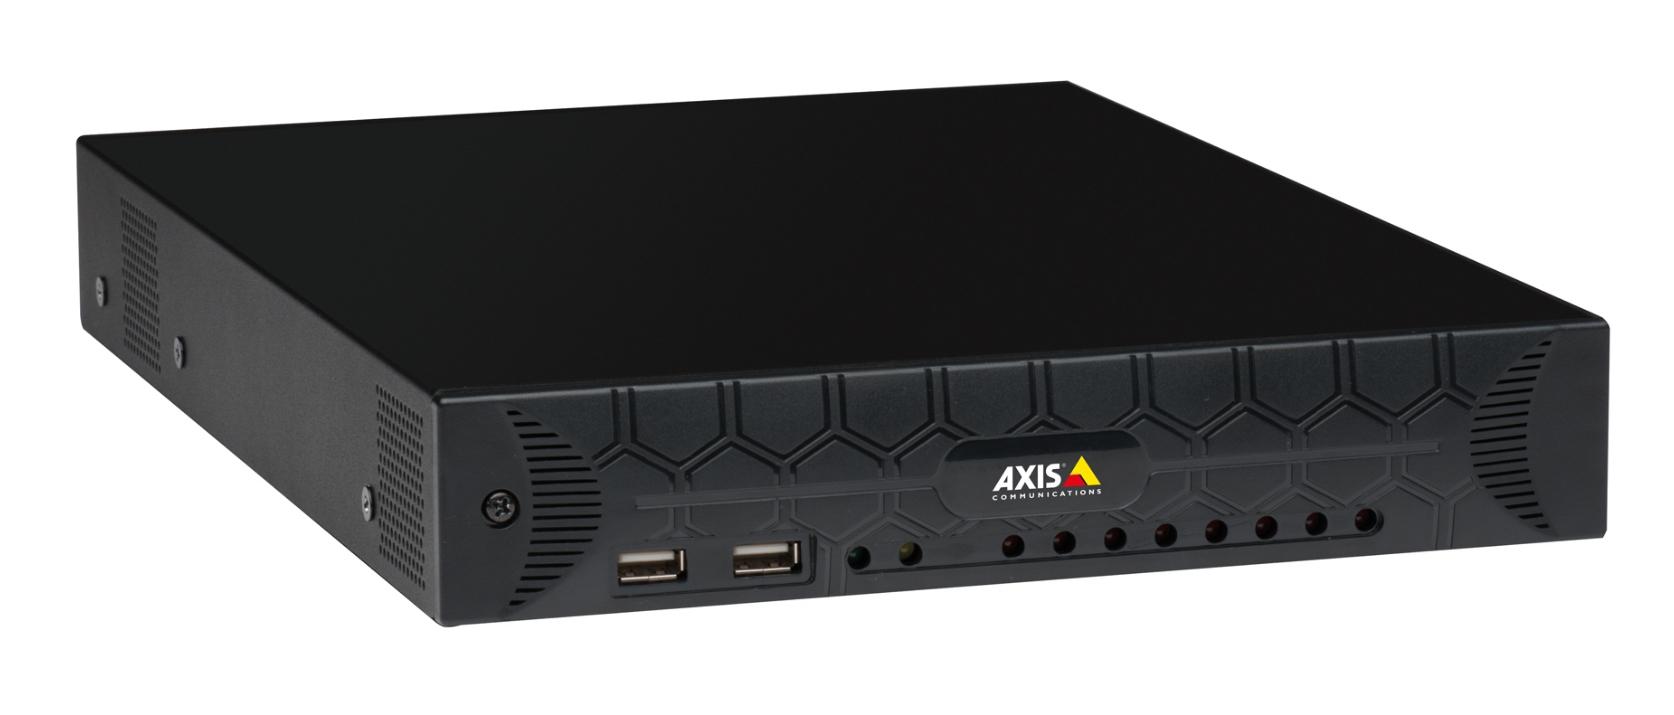 S2008 Camera Station Appliance